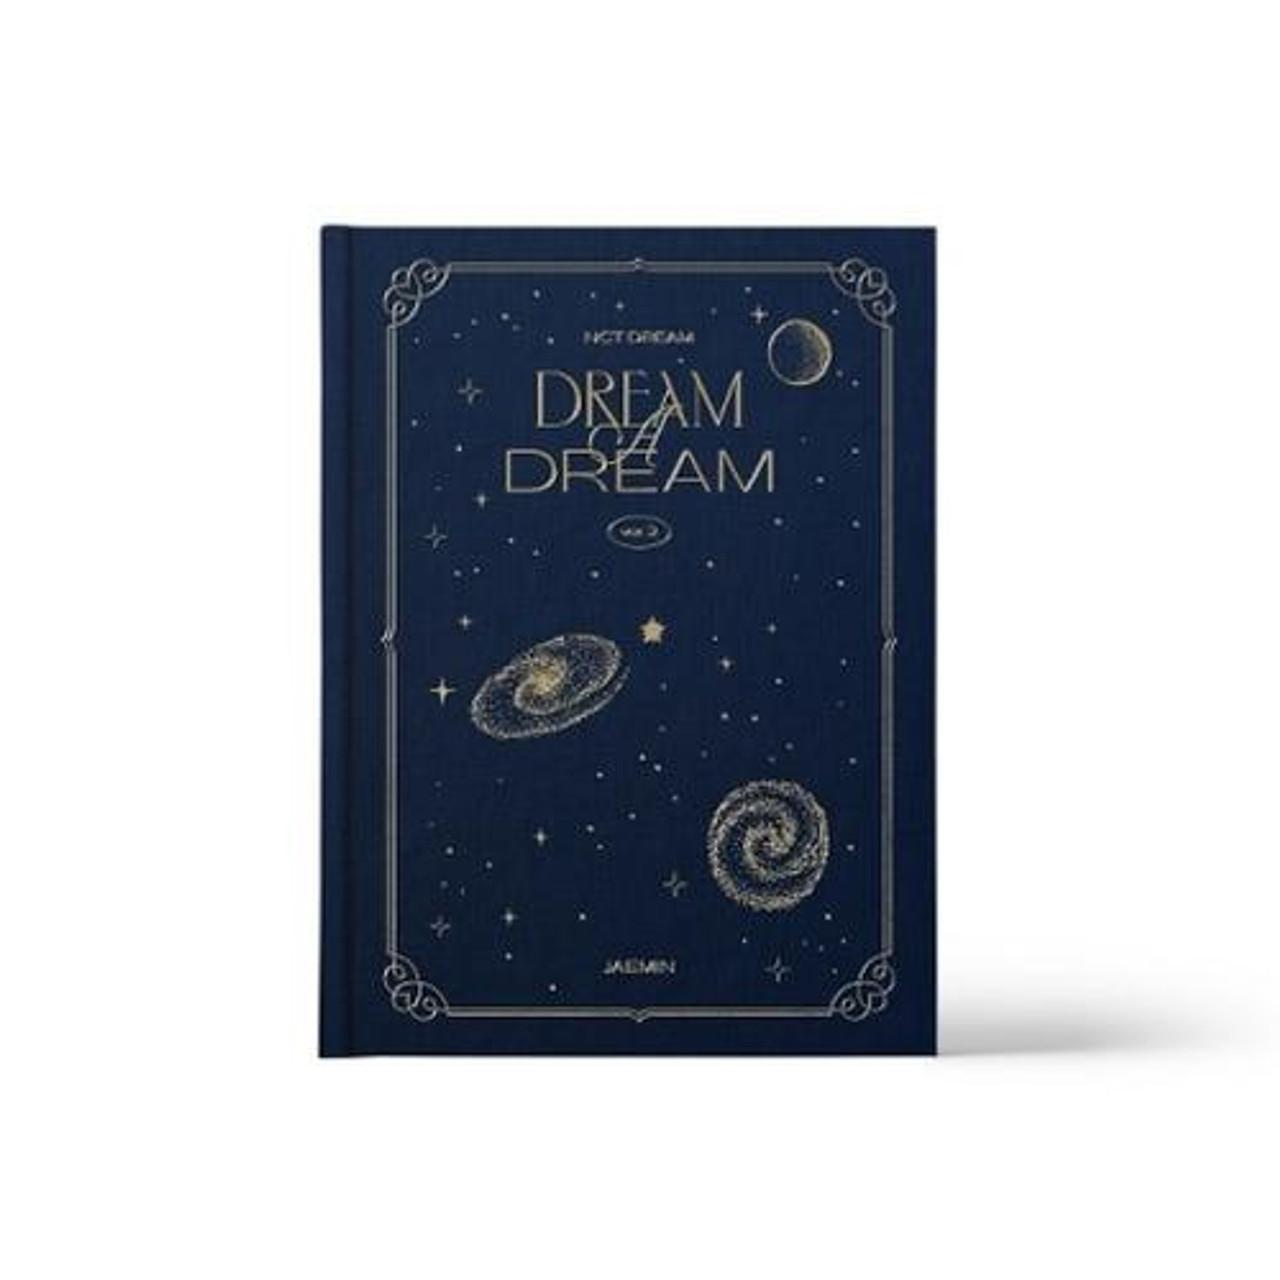 NCT DREAM-PHOTOBOOK [DREAM A DREAM ver.2] [JAEMIN]